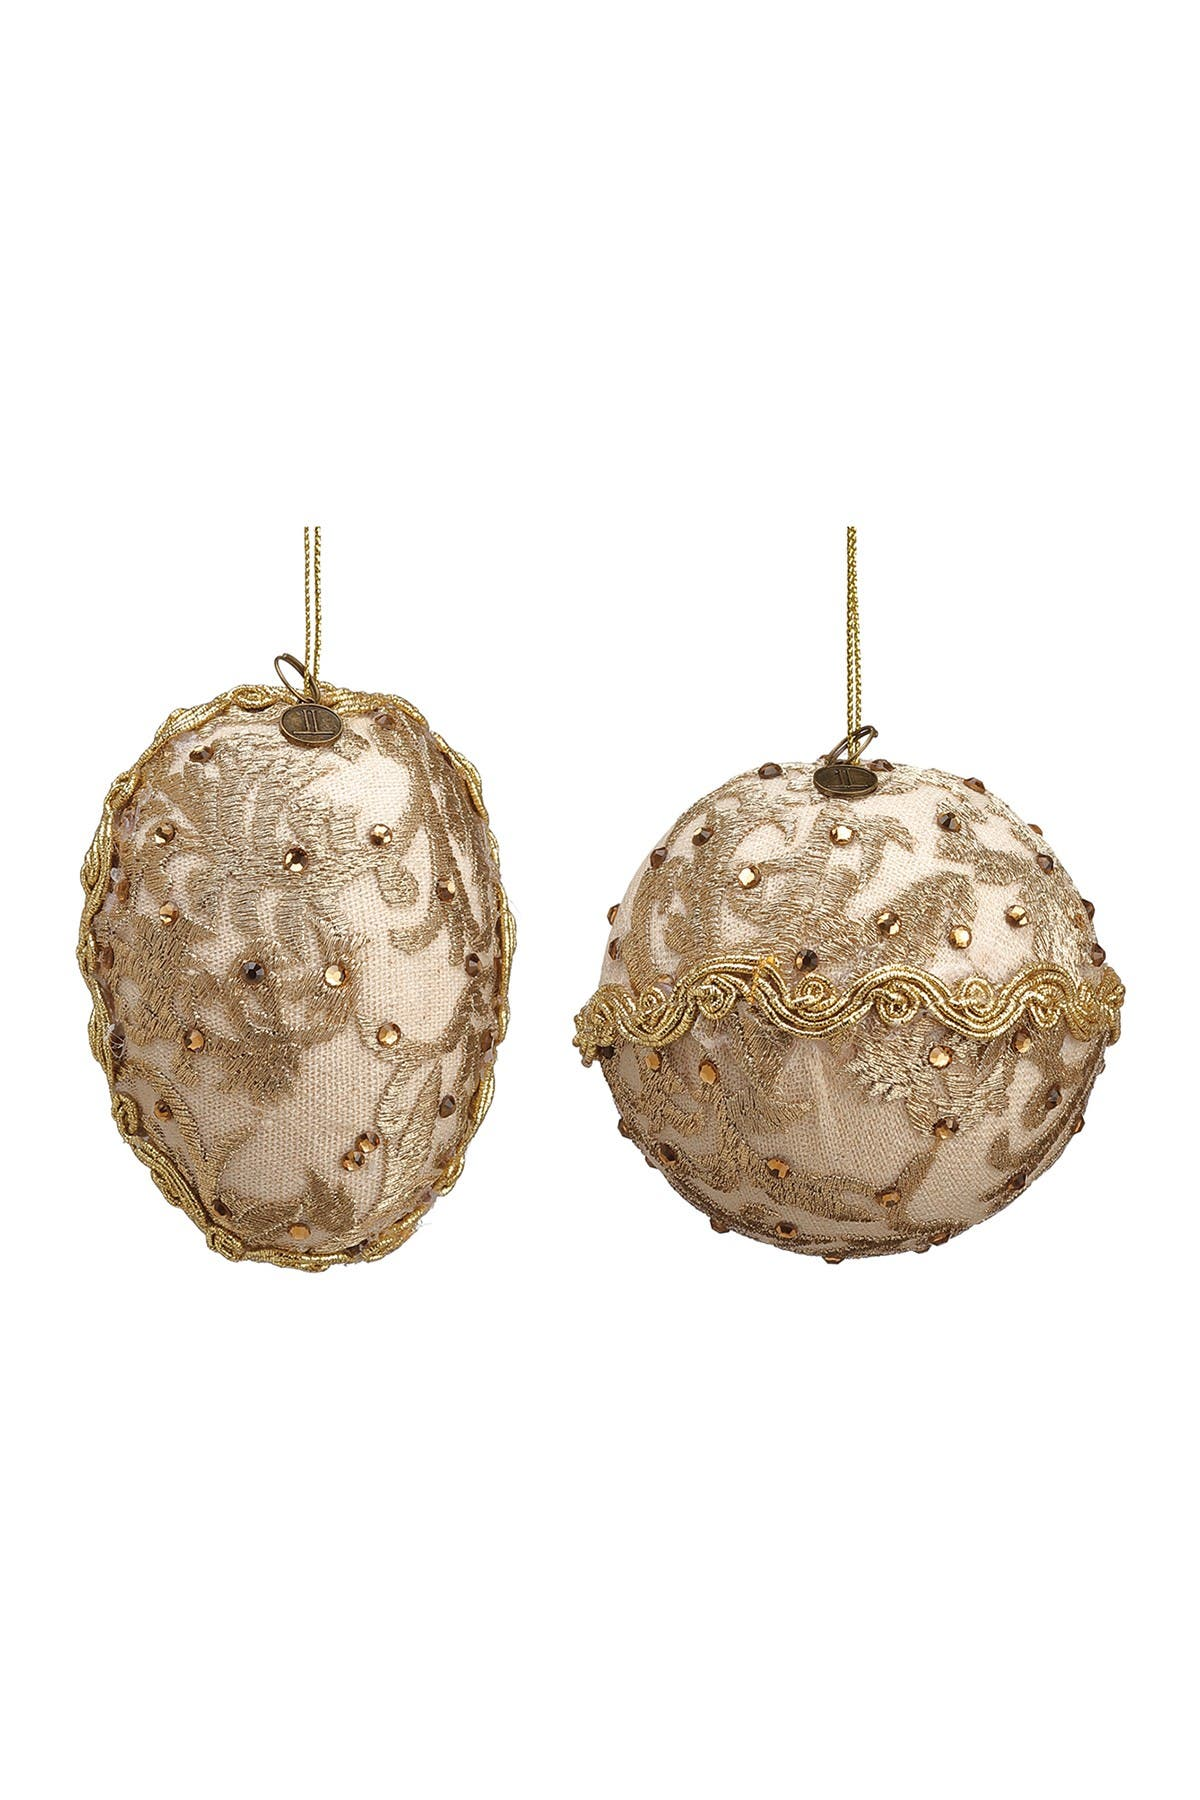 "Image of ALLSTATE 3"" Rhinestone Ball/Finial Ornament 2-Piece Set"